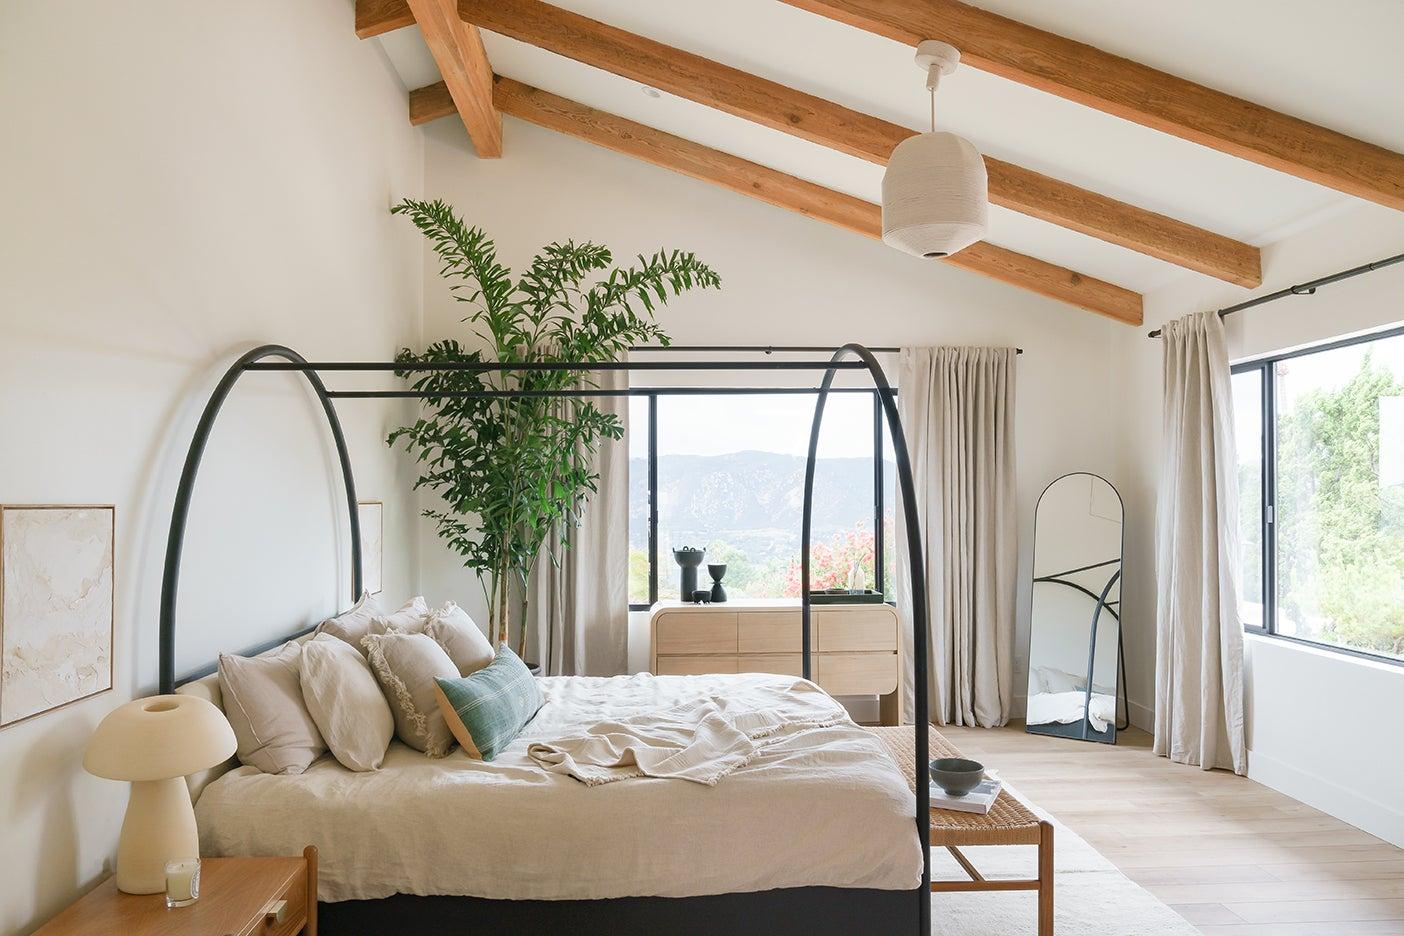 vaulted bedroom ceiling